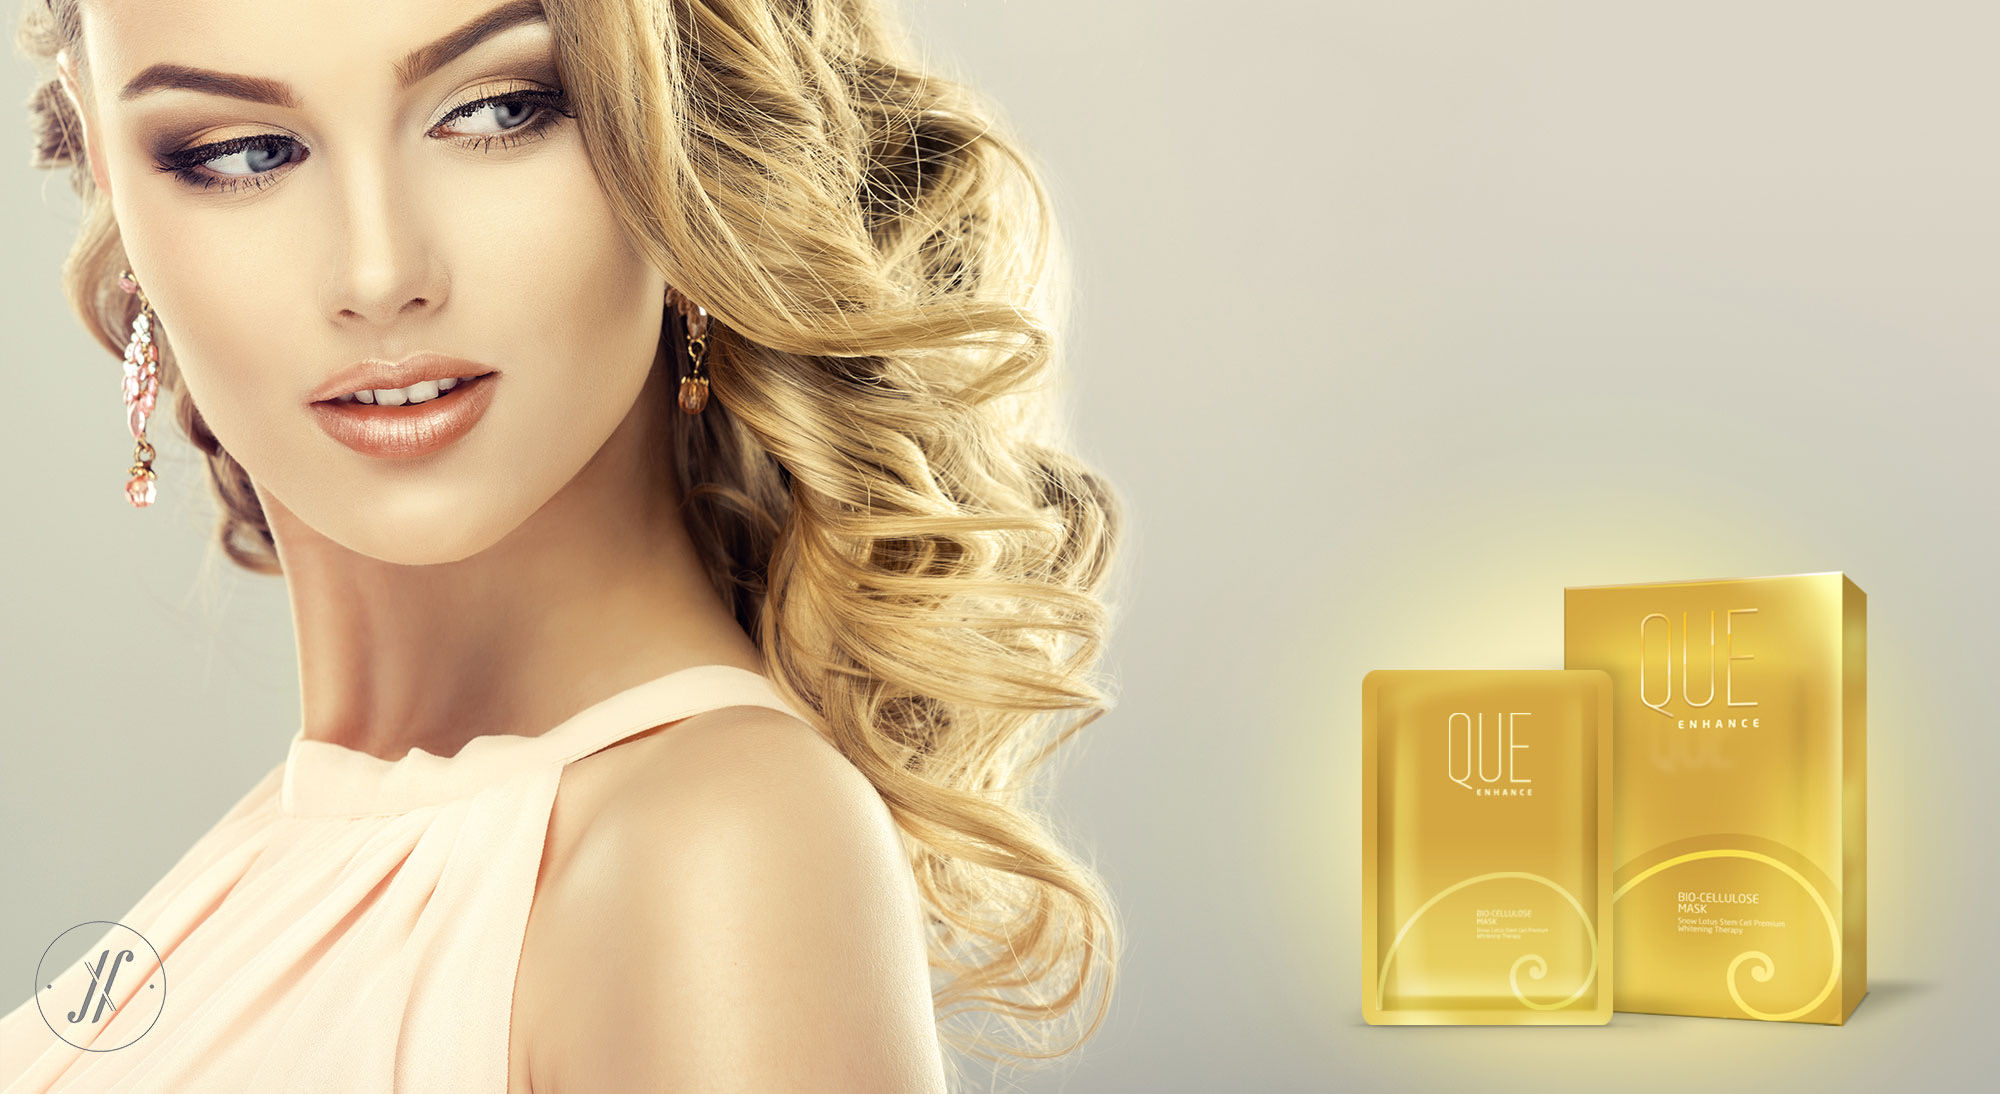 Yellow Fishes Branding Agency Mumbai Que Premium Luxury Cosmetics Branding London British Branding Skin care Golden Spiral Fibonacci Spiral giel cosmetcis ad poster design.jpeg